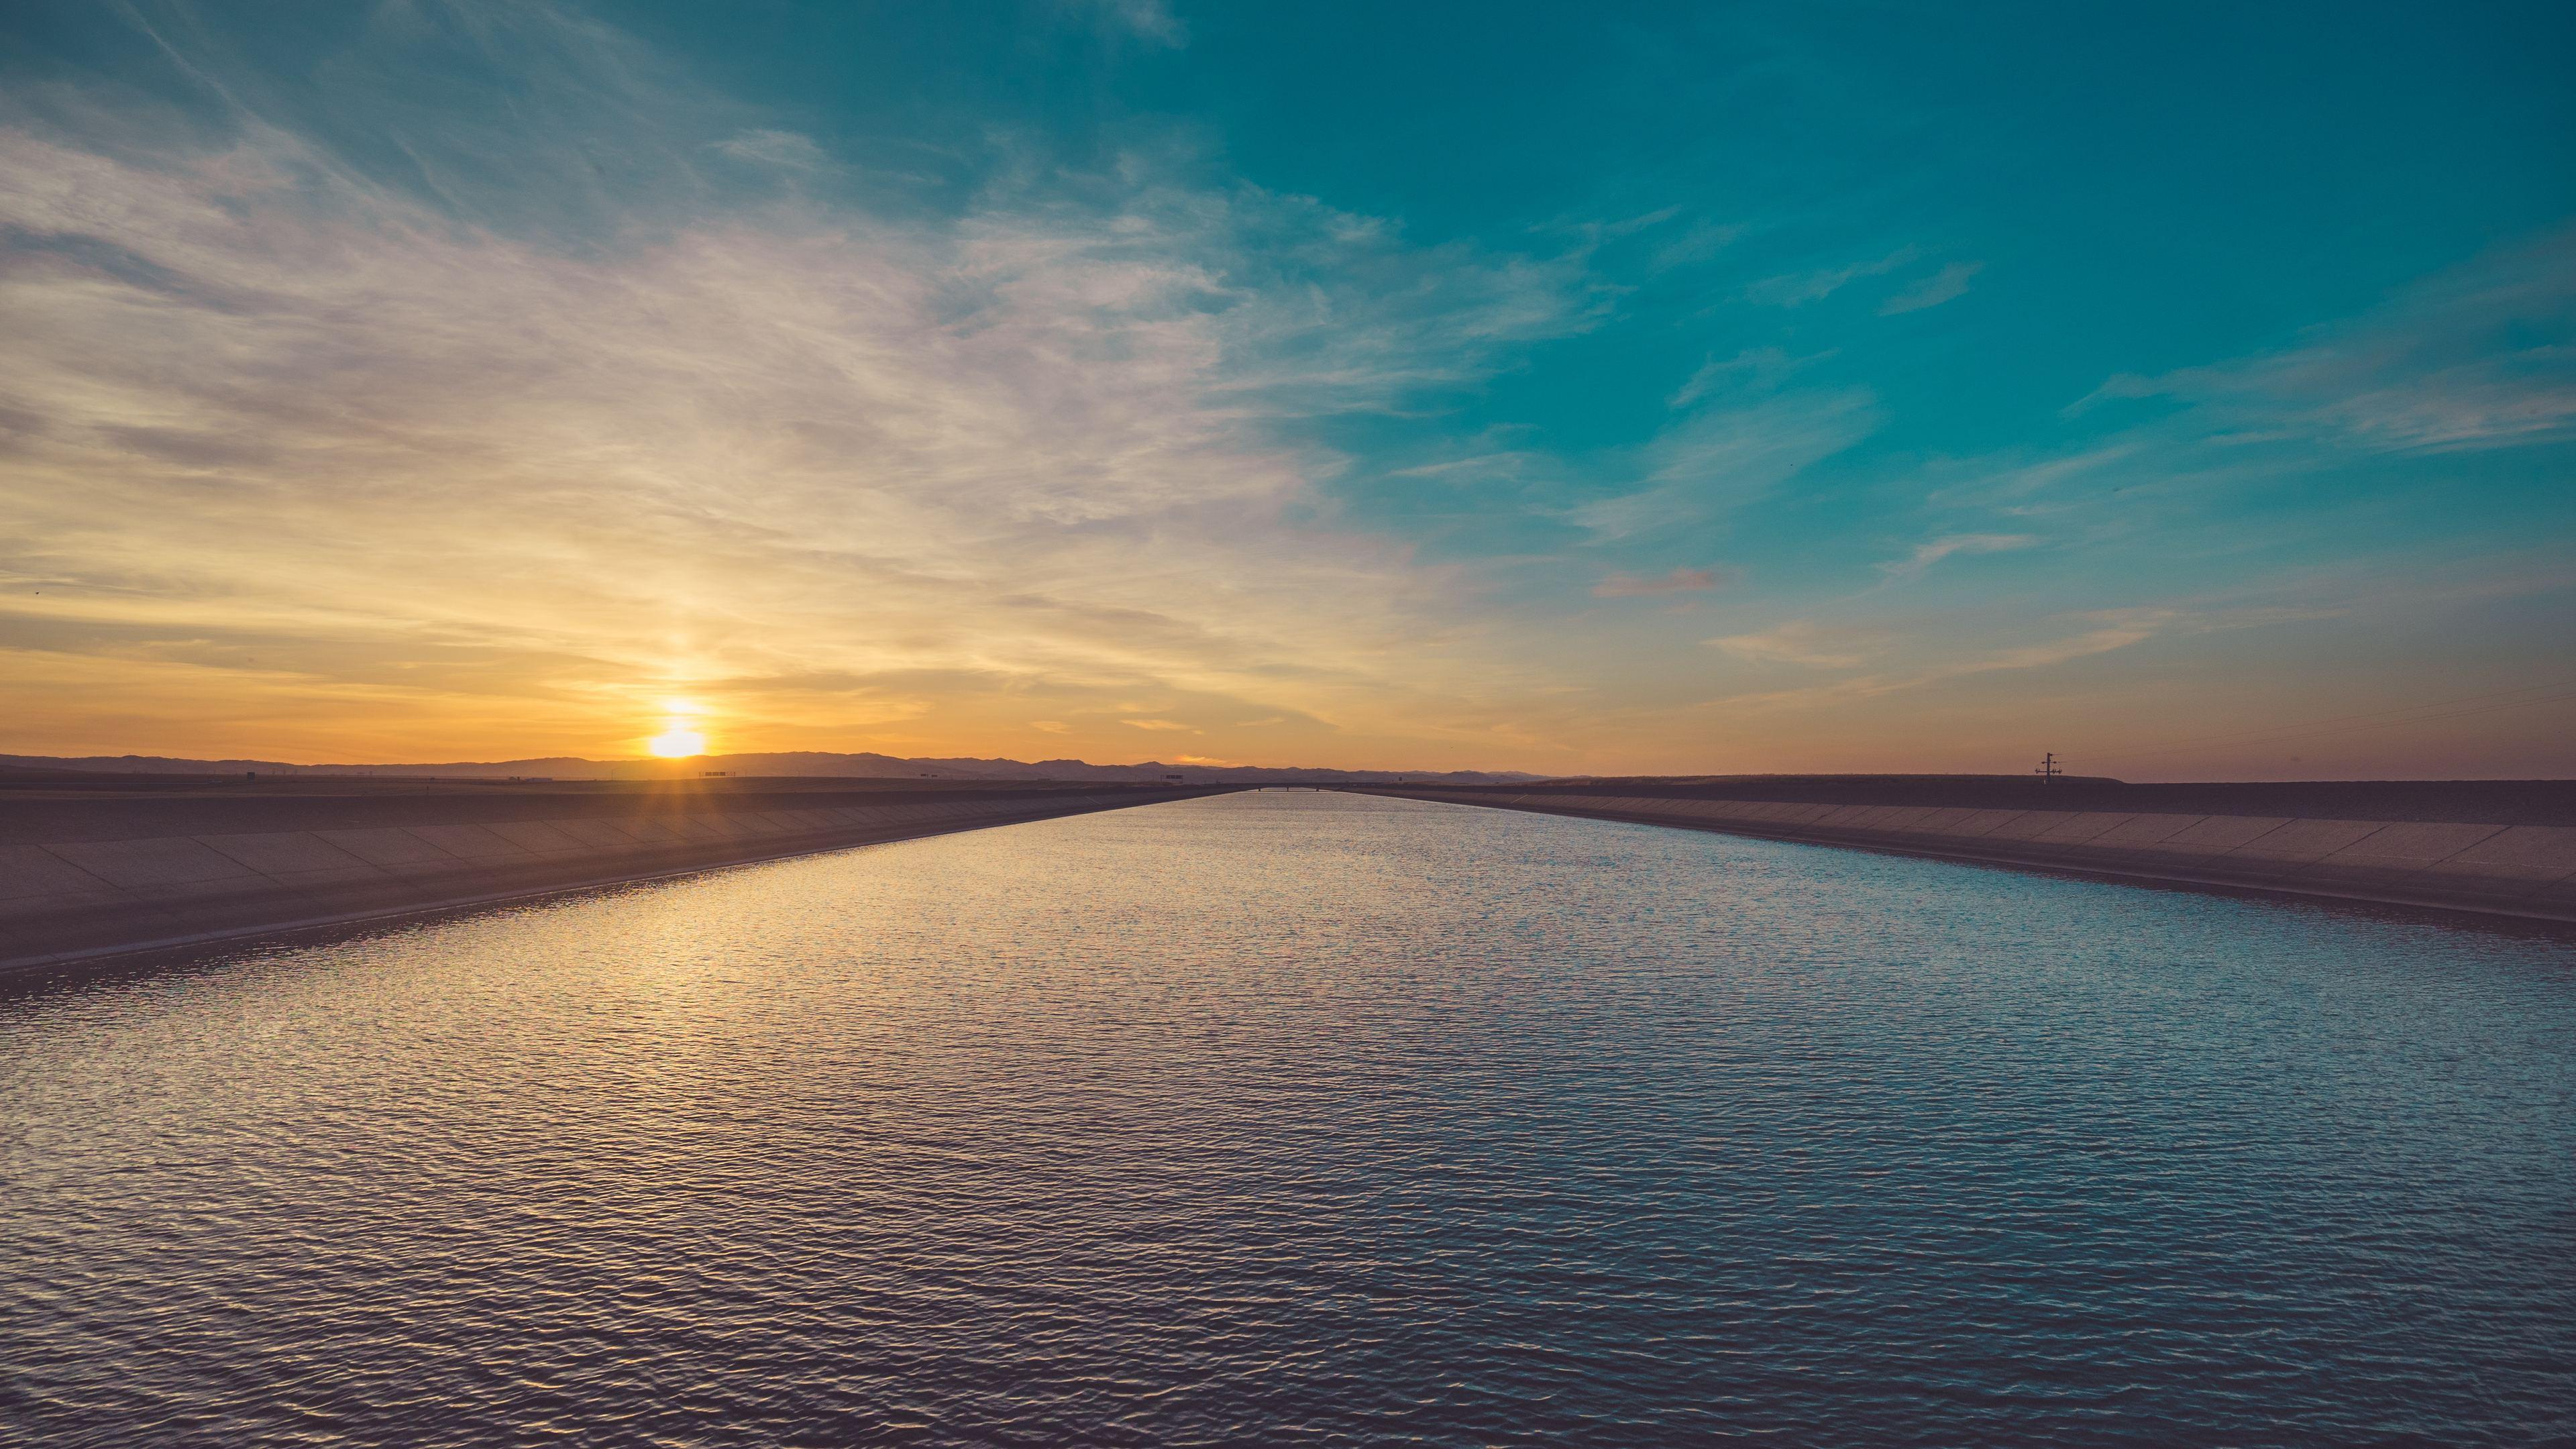 river landscape sun beams 4k 1551643681 - River Landscape Sun Beams 4k - sunset wallpapers, sunrise wallpapers, sunbeam wallpapers, sky wallpapers, river wallpapers, nature wallpapers, landscape wallpapers, hd-wallpapers, 4k-wallpapers